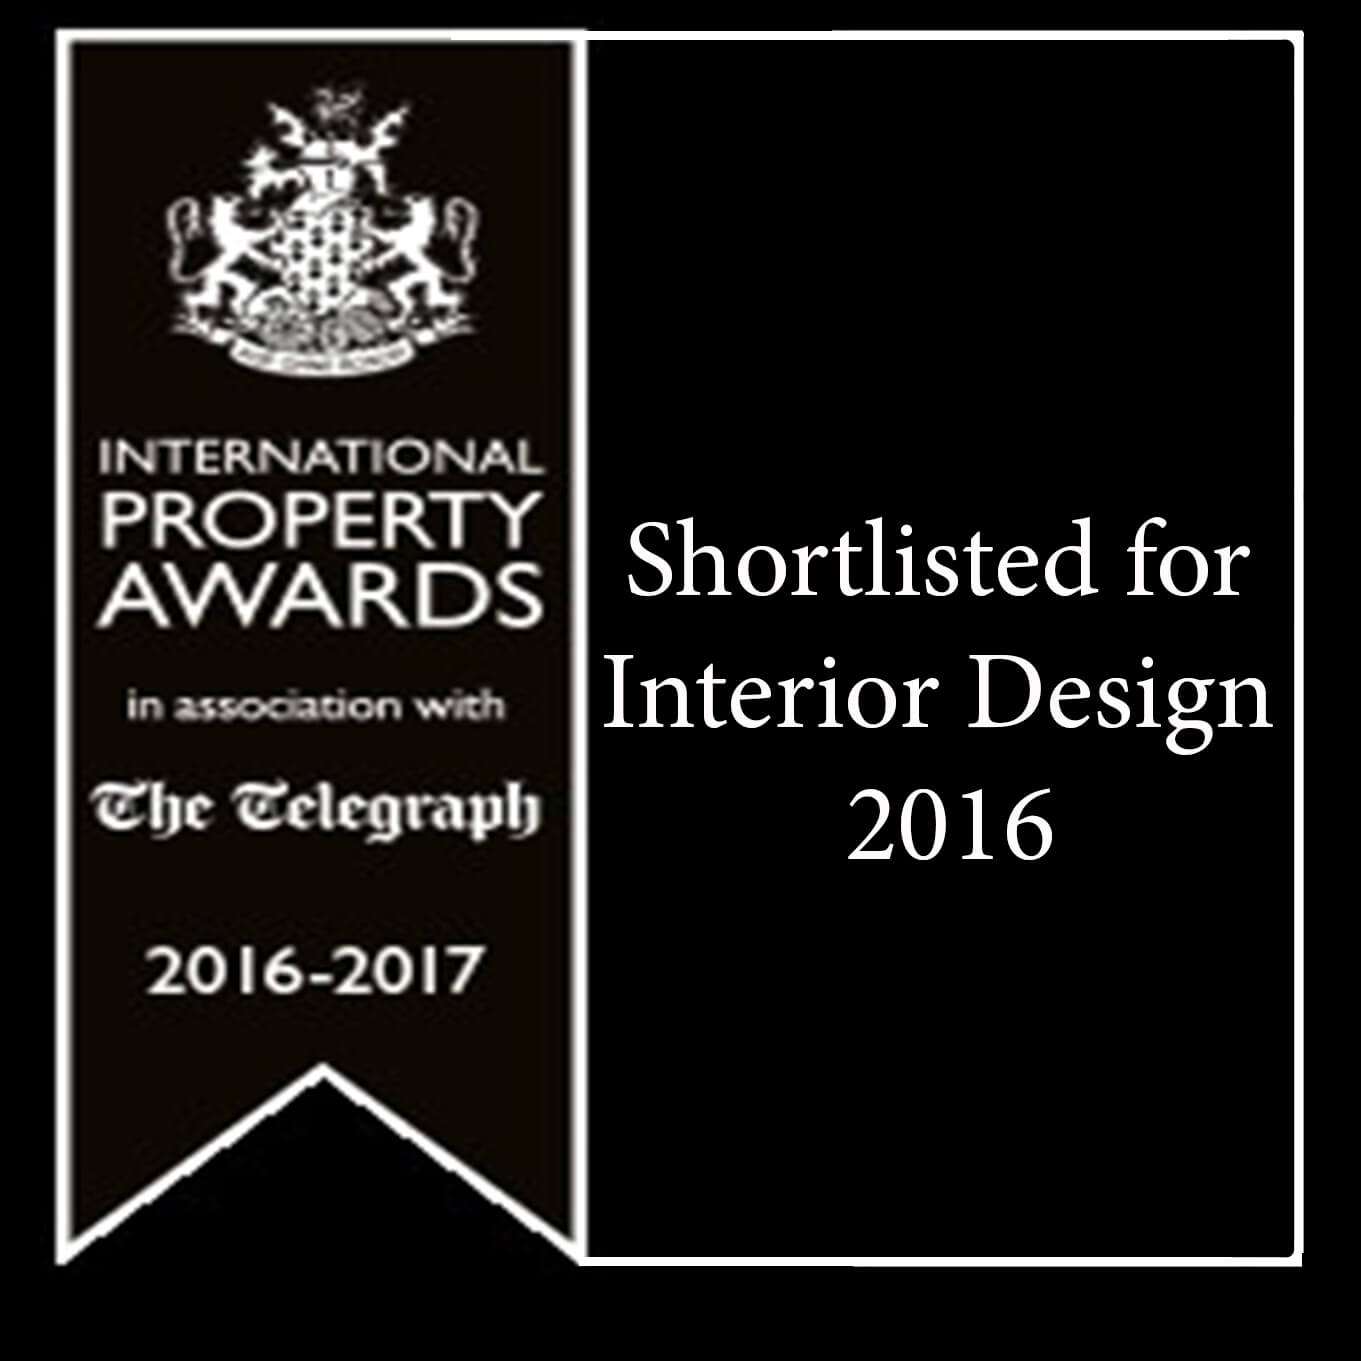 International Property Awards 2016